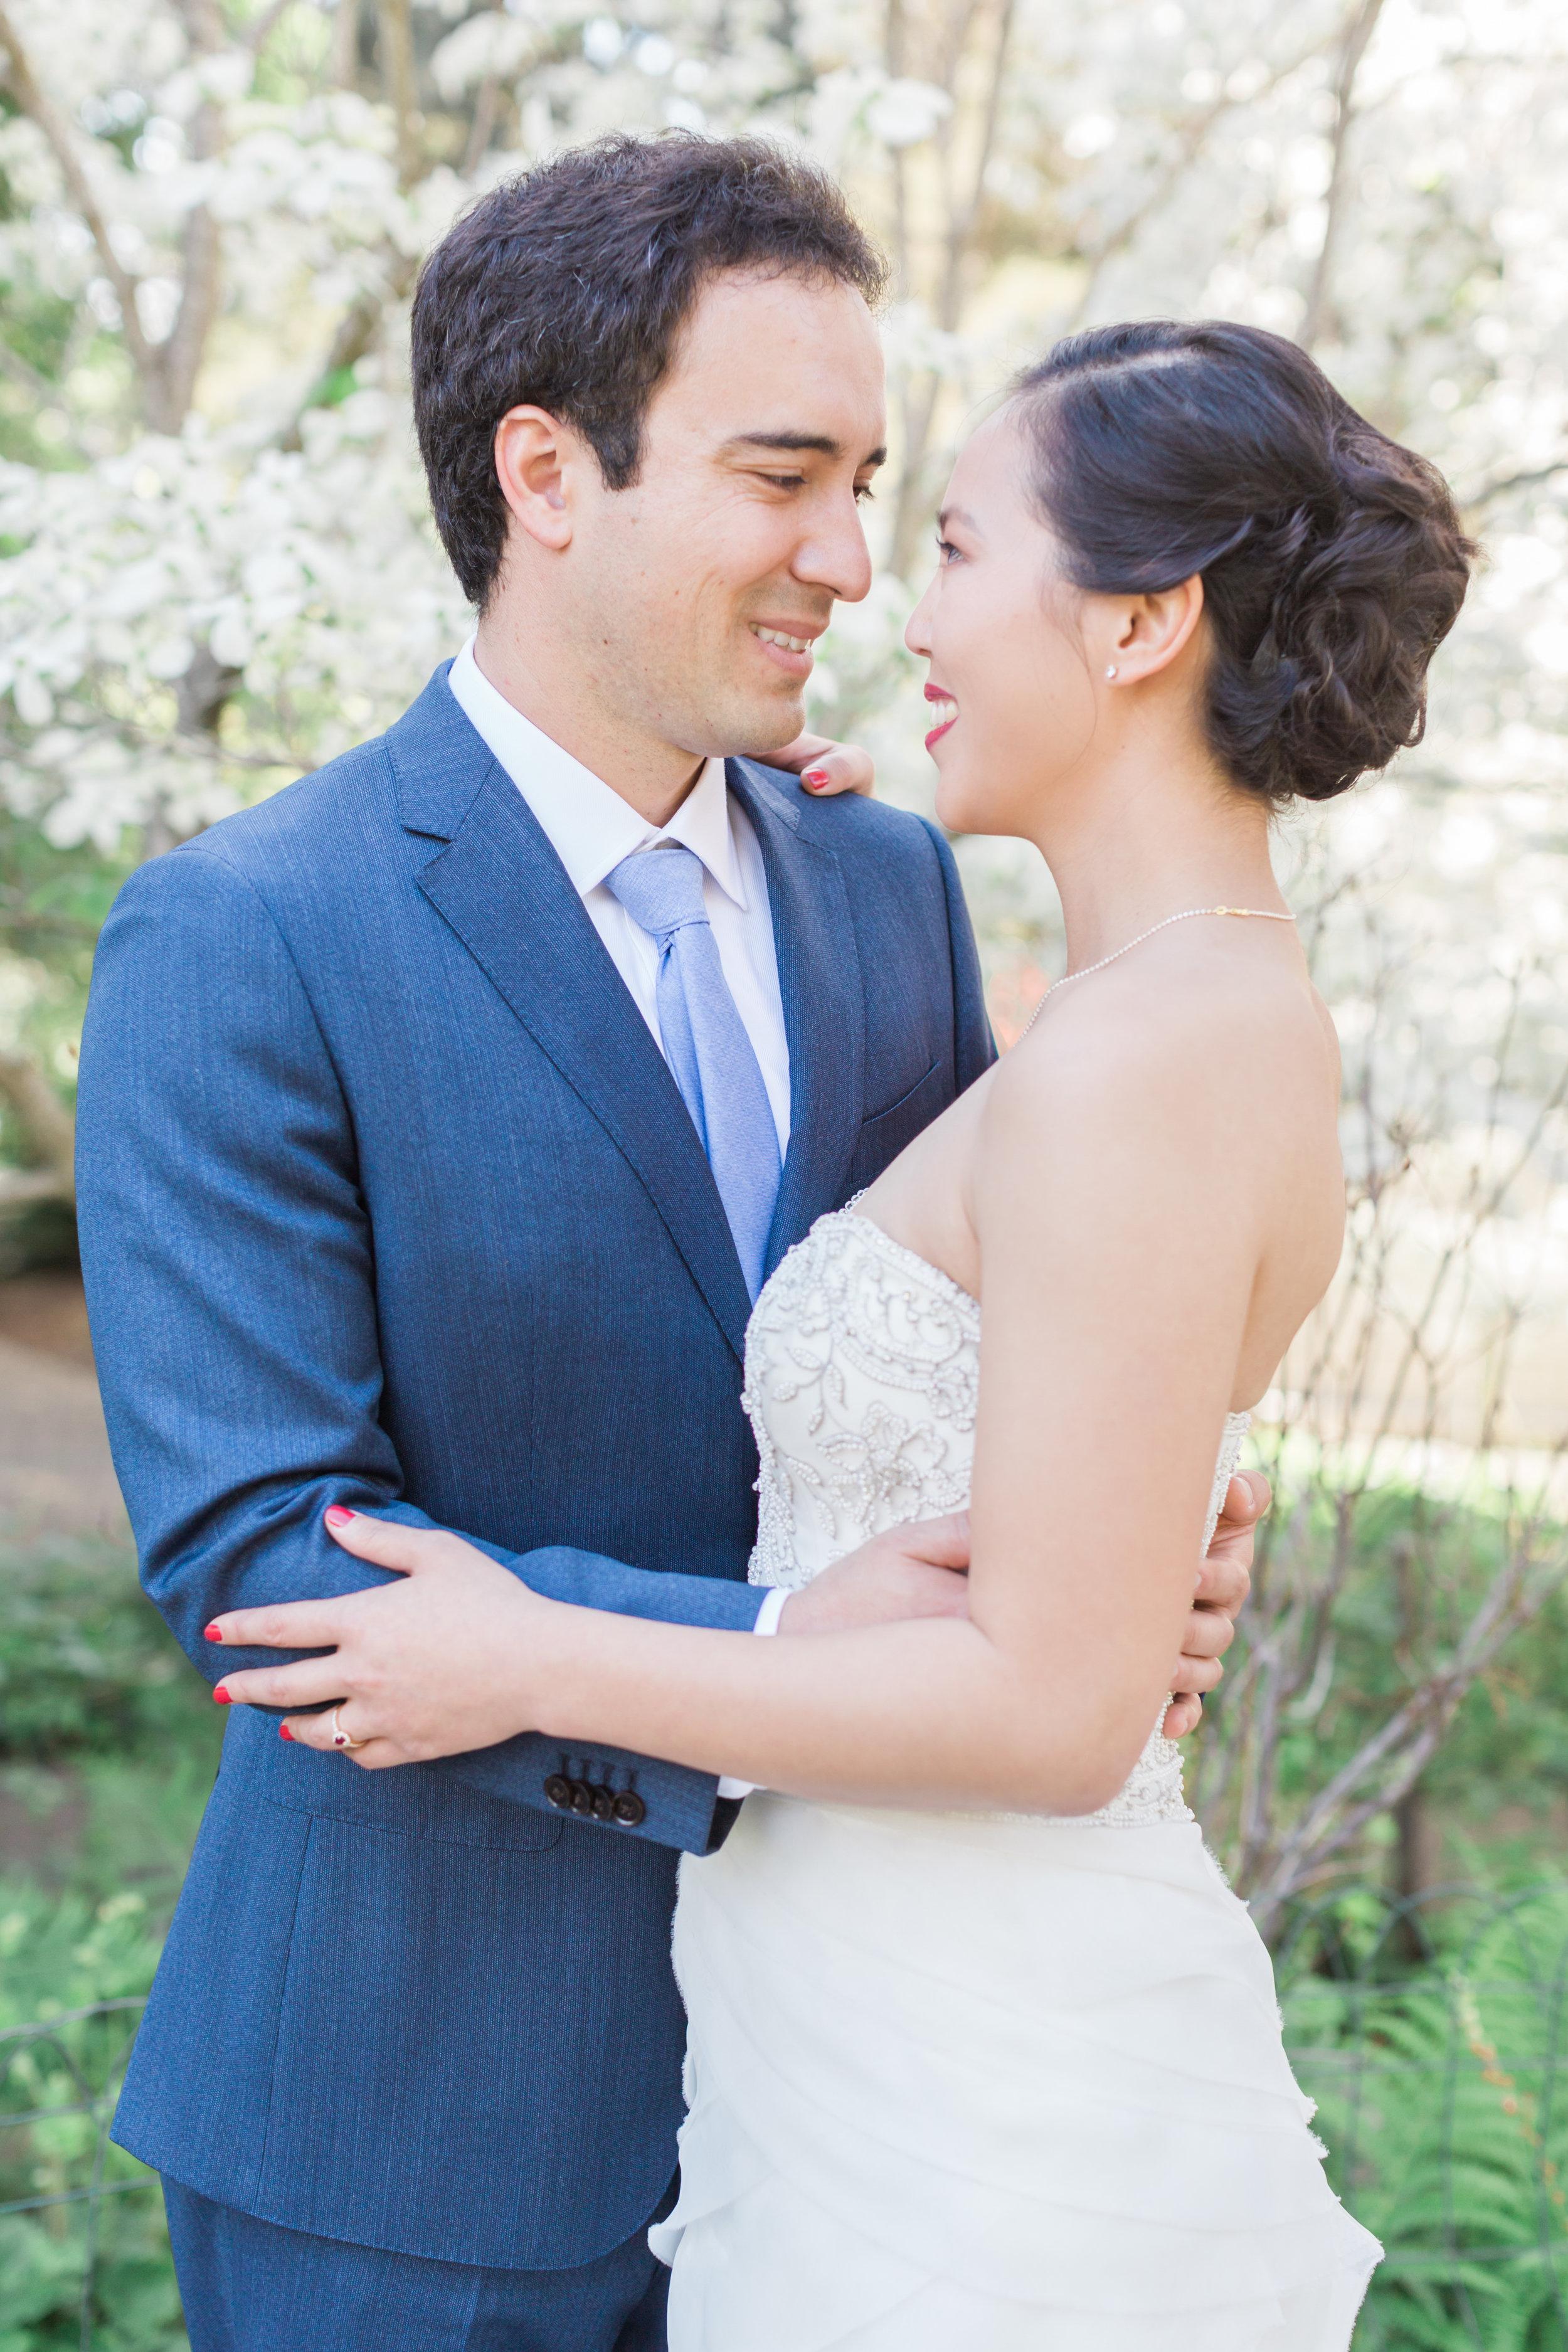 oakland-bride-groom-wedding-portrait.jpg